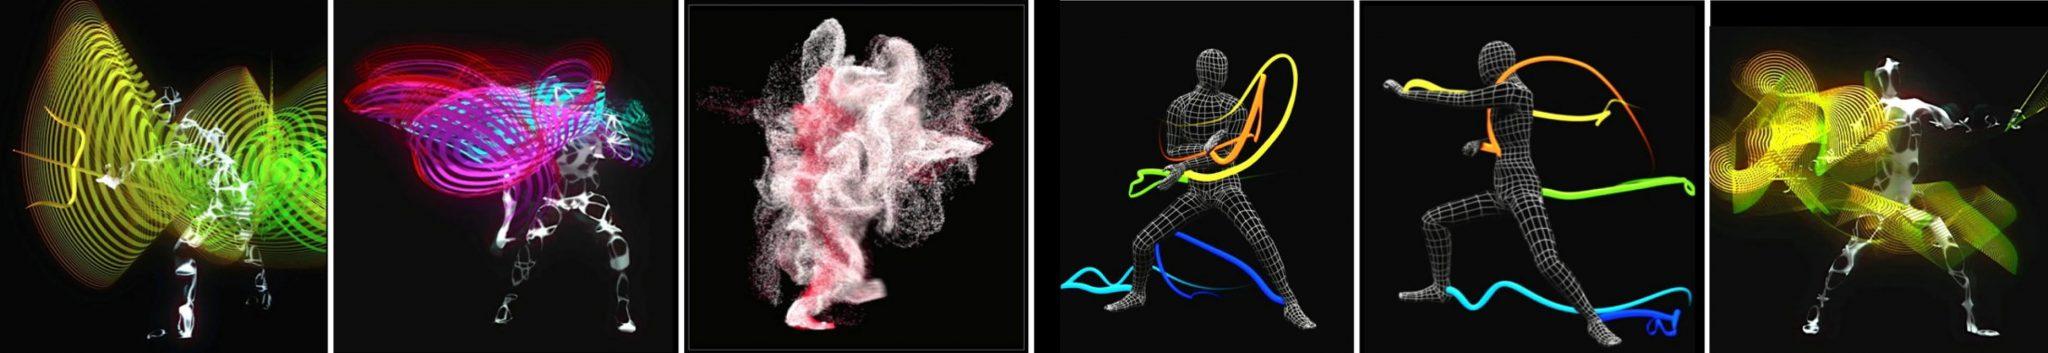 motion capture of kung fu